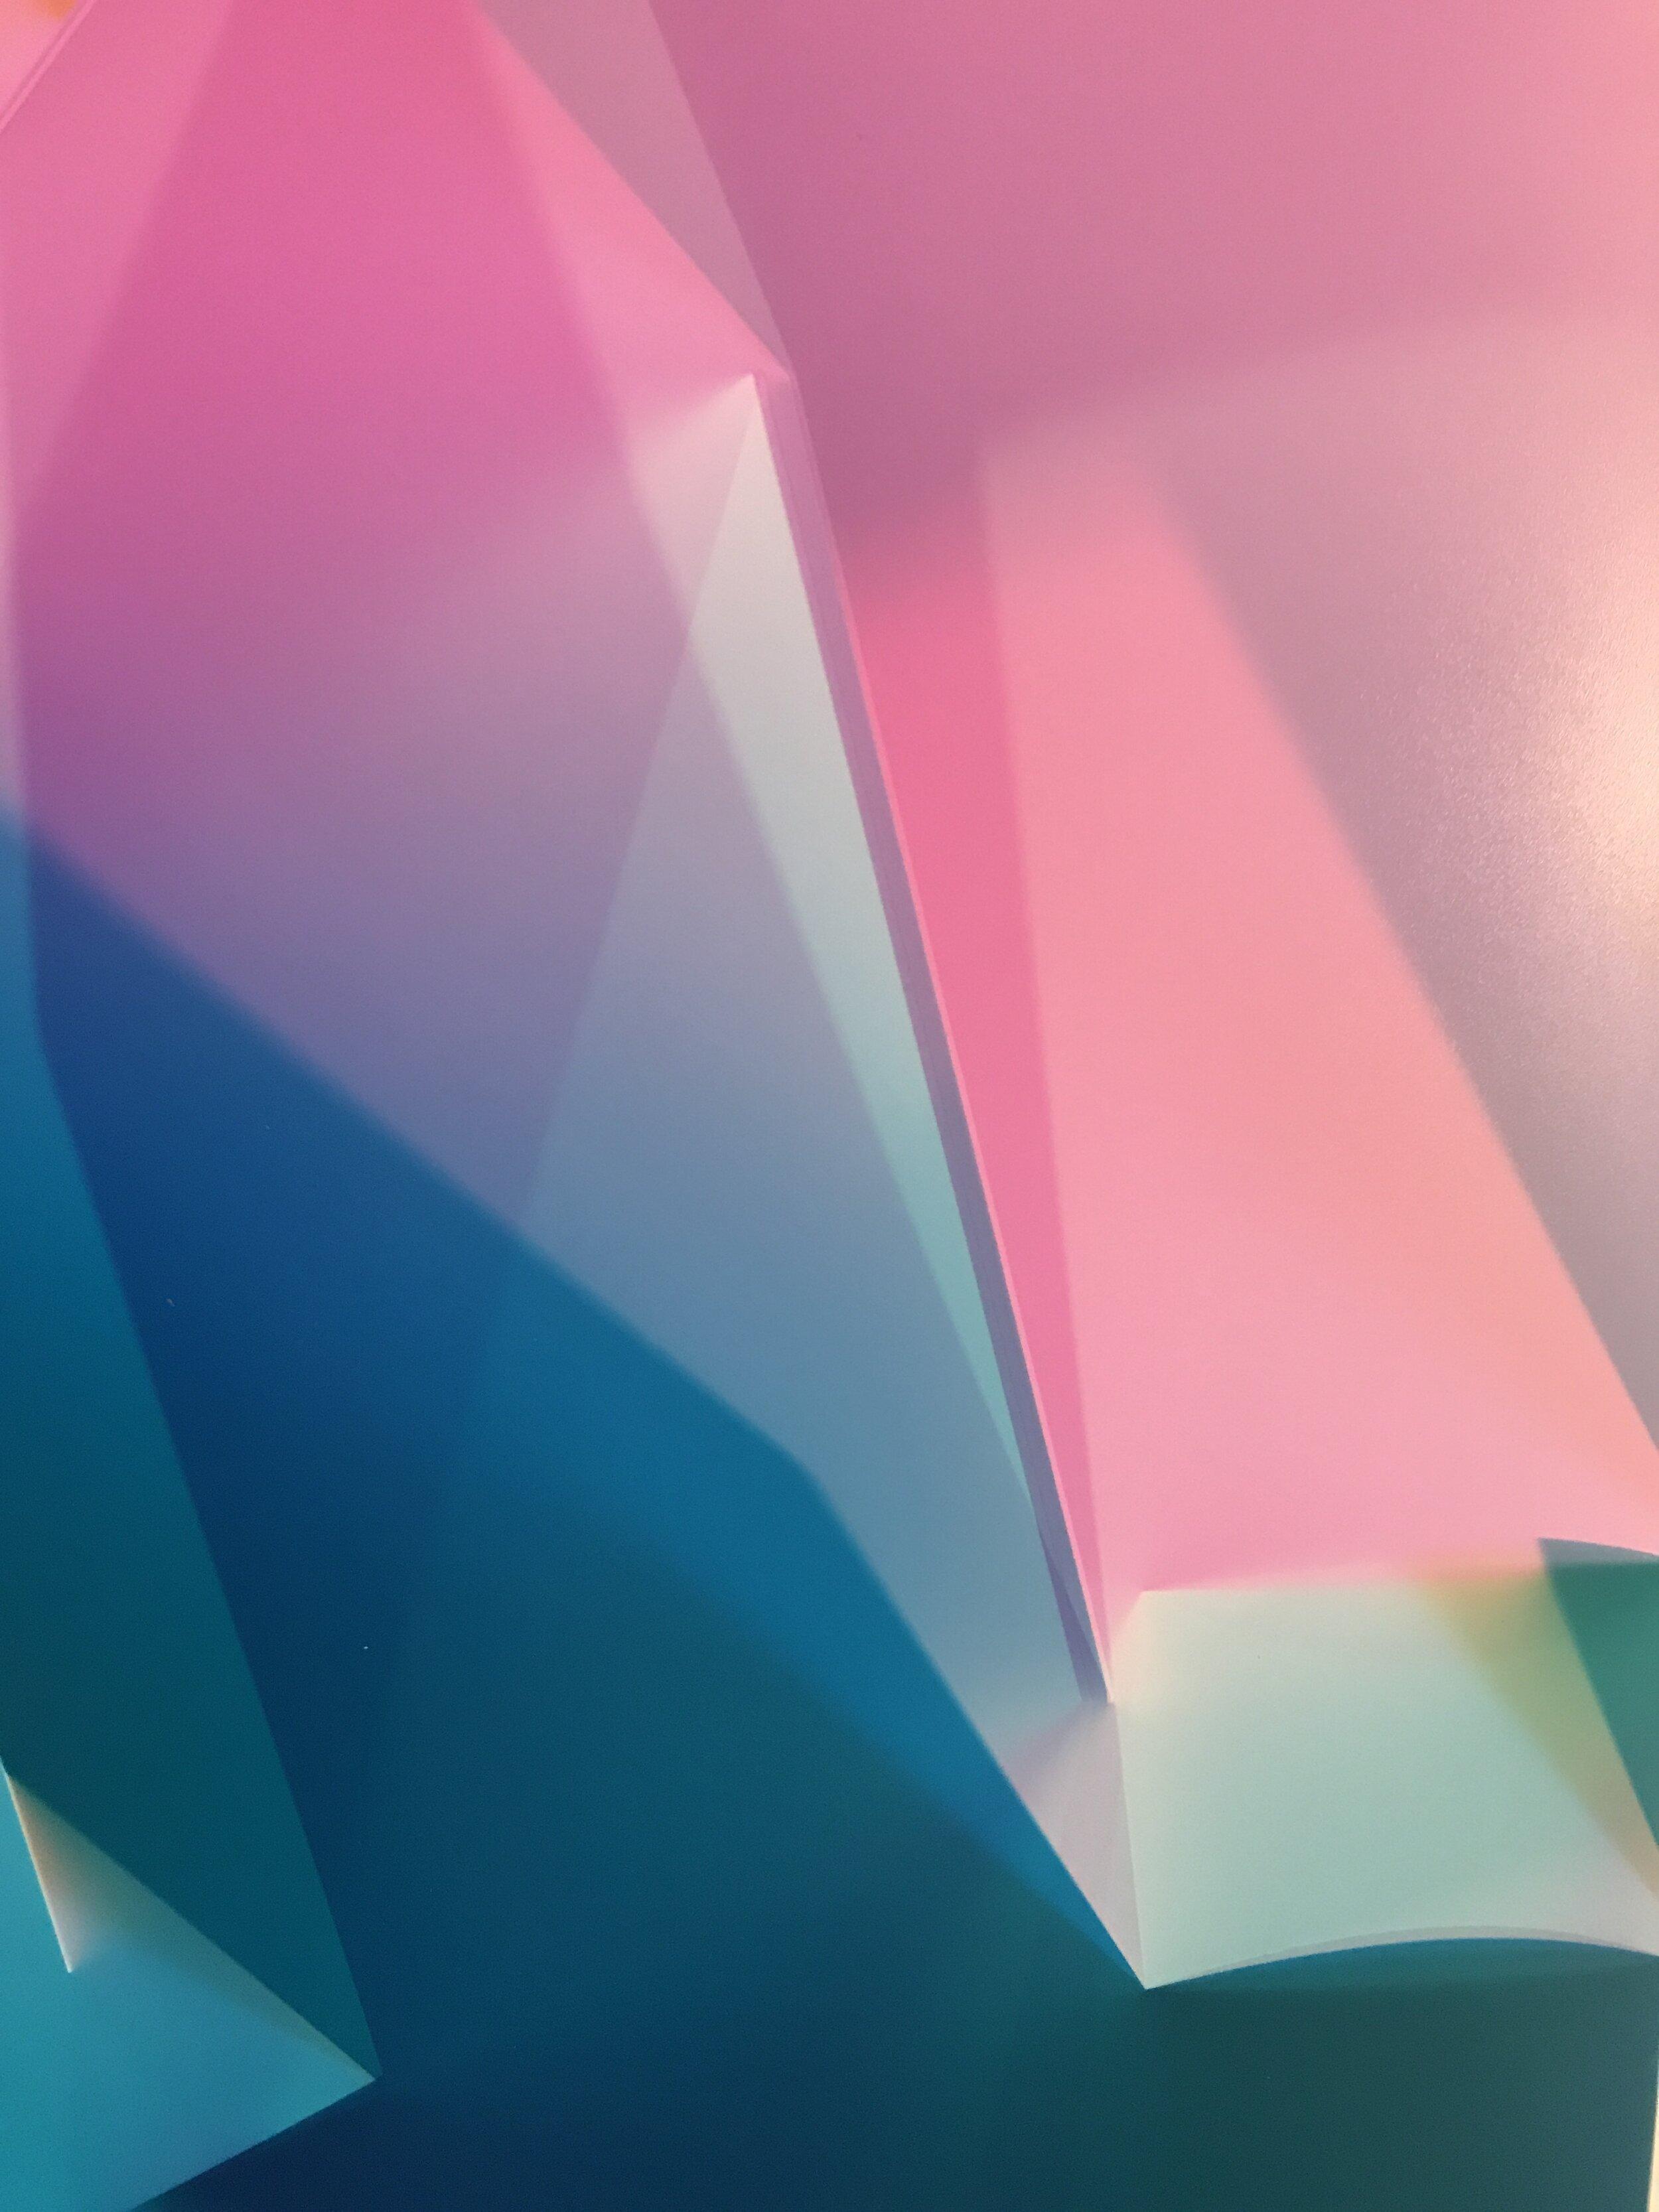 Natalja Kent Group Study Movement Artifacts Unusual Colors 8